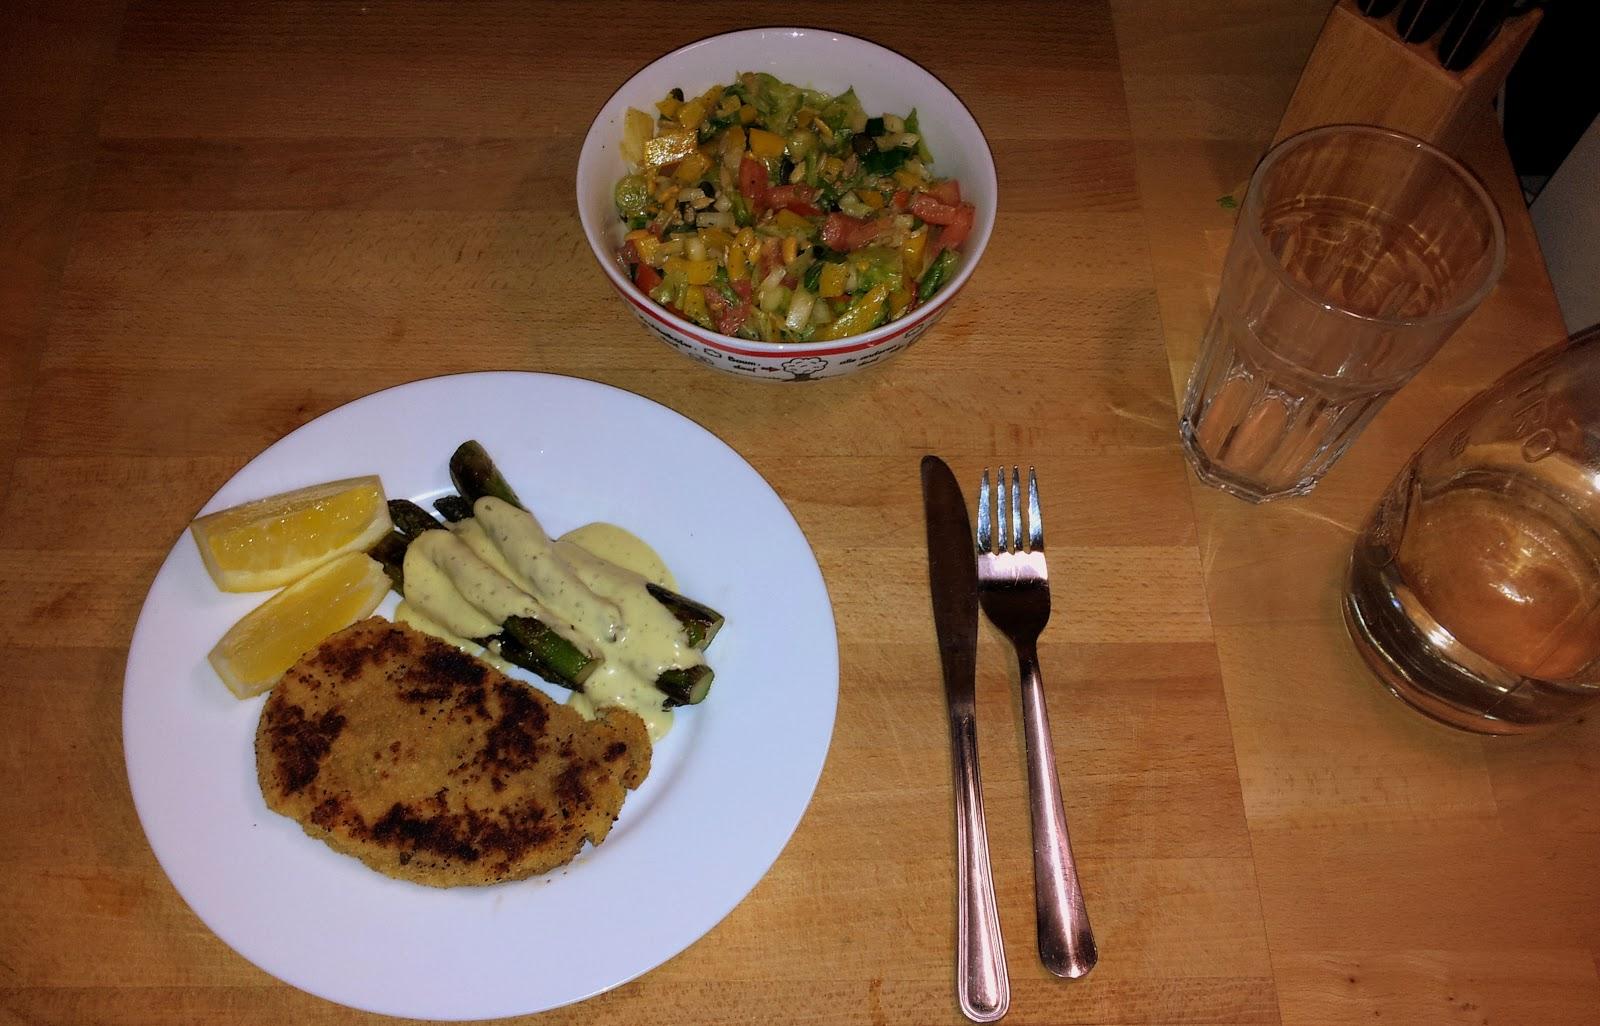 hungert ter gr ner spargel salat und schnitzel einfach. Black Bedroom Furniture Sets. Home Design Ideas